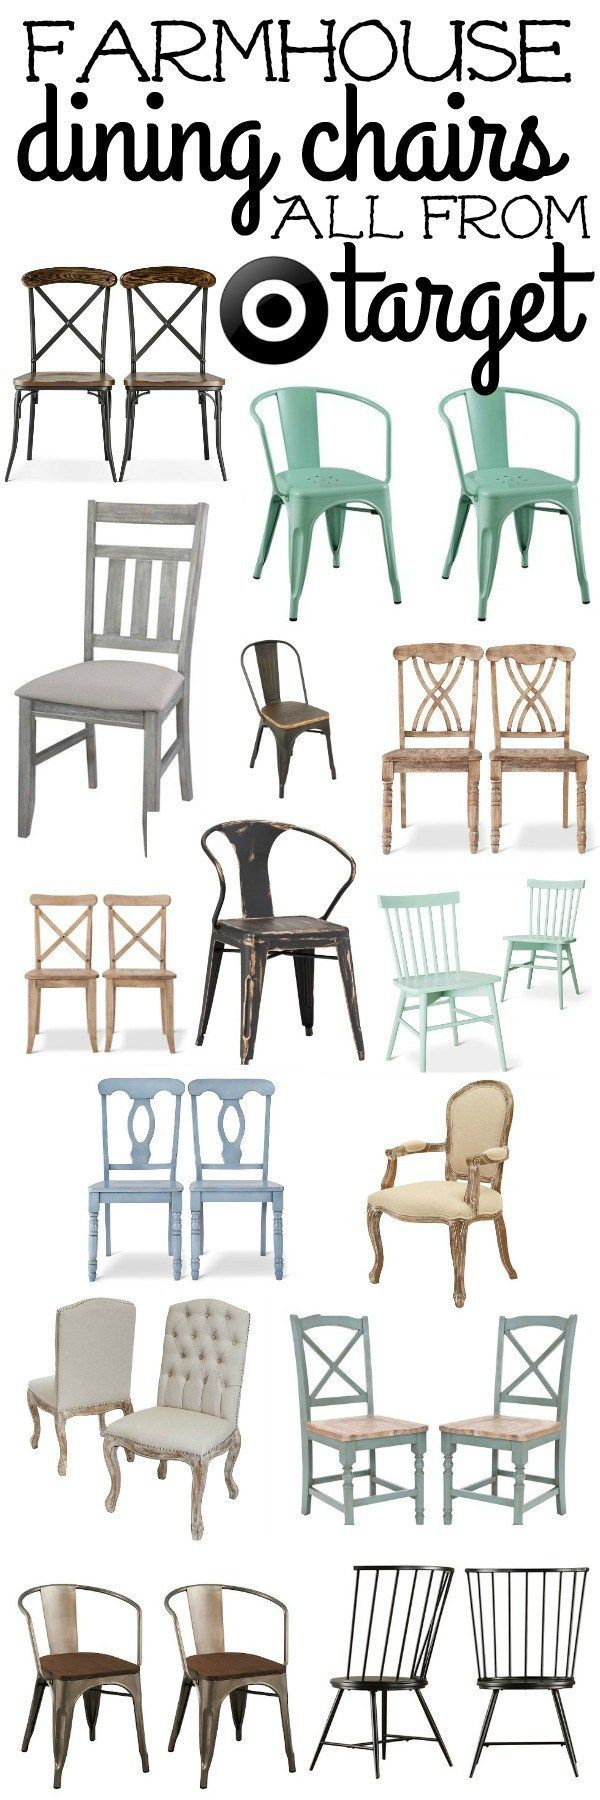 Farmhouse Dining Chairs | Liz Marie | Bloglovin'